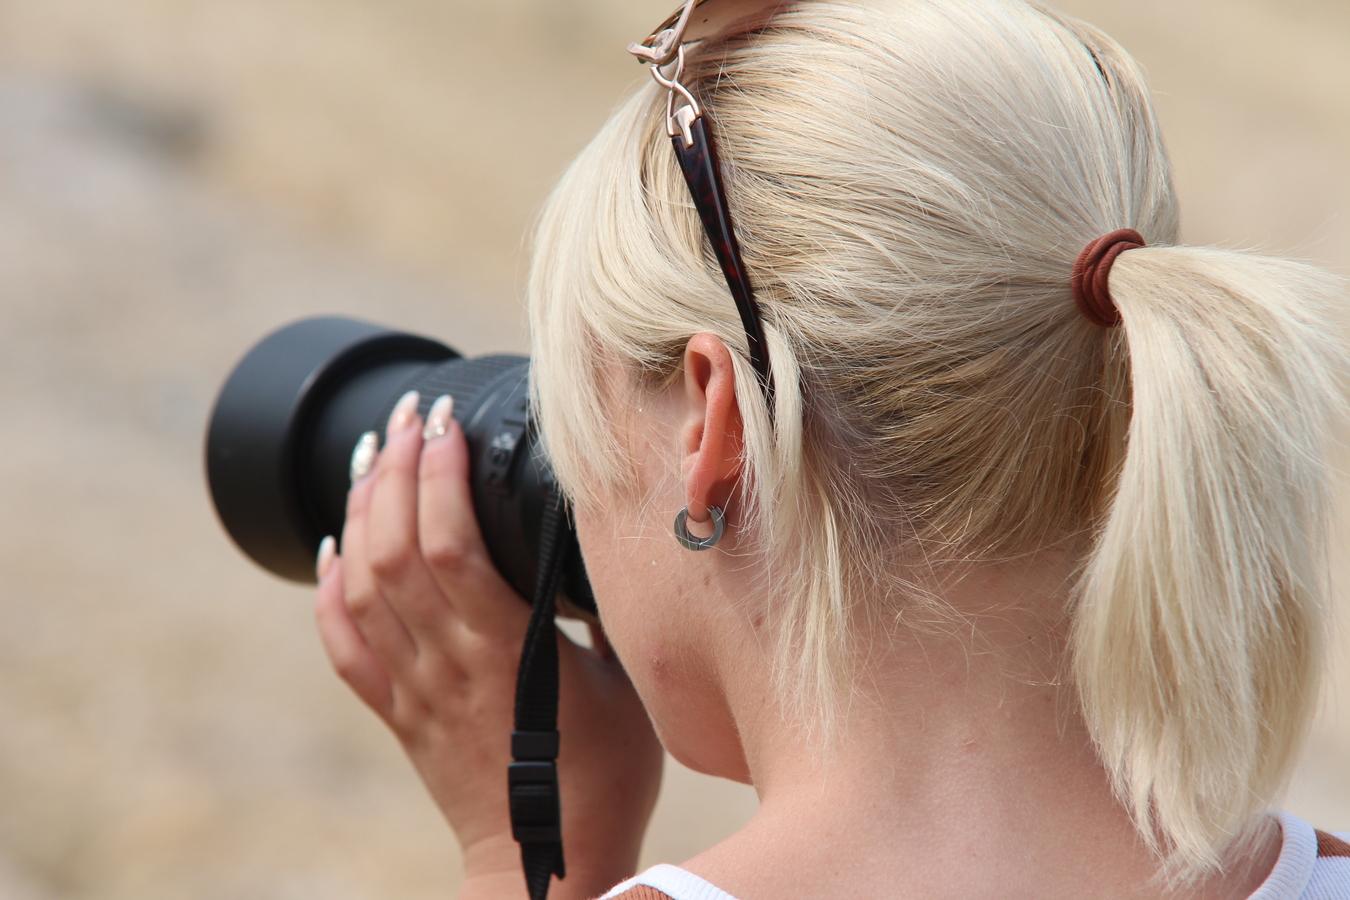 Vyfocená fotogravka, ehm - fotografka :-)